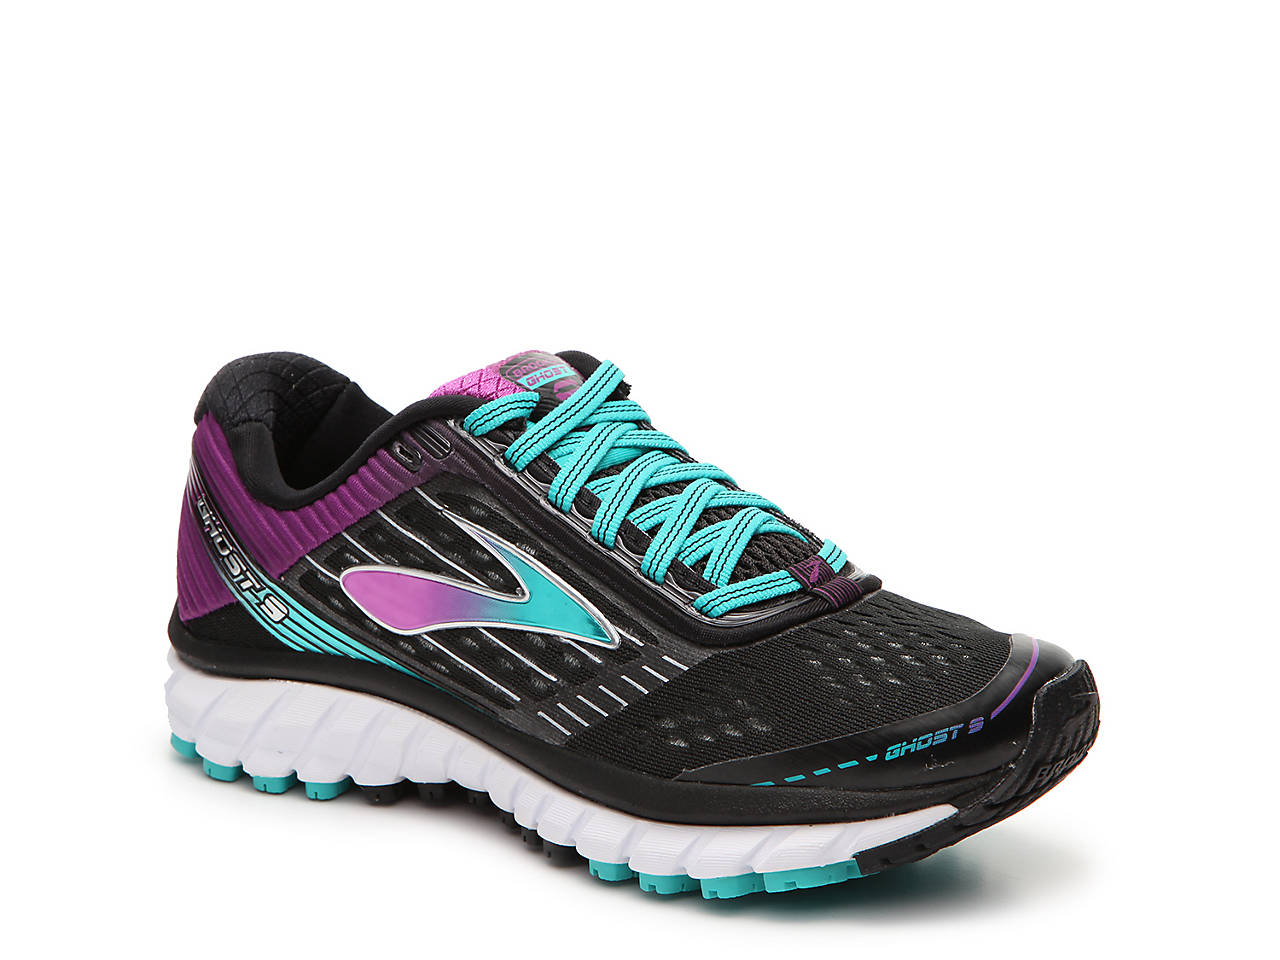 5db80b46404 Brooks Ghost 9 Performance Running Shoe - Women s Women s Shoes